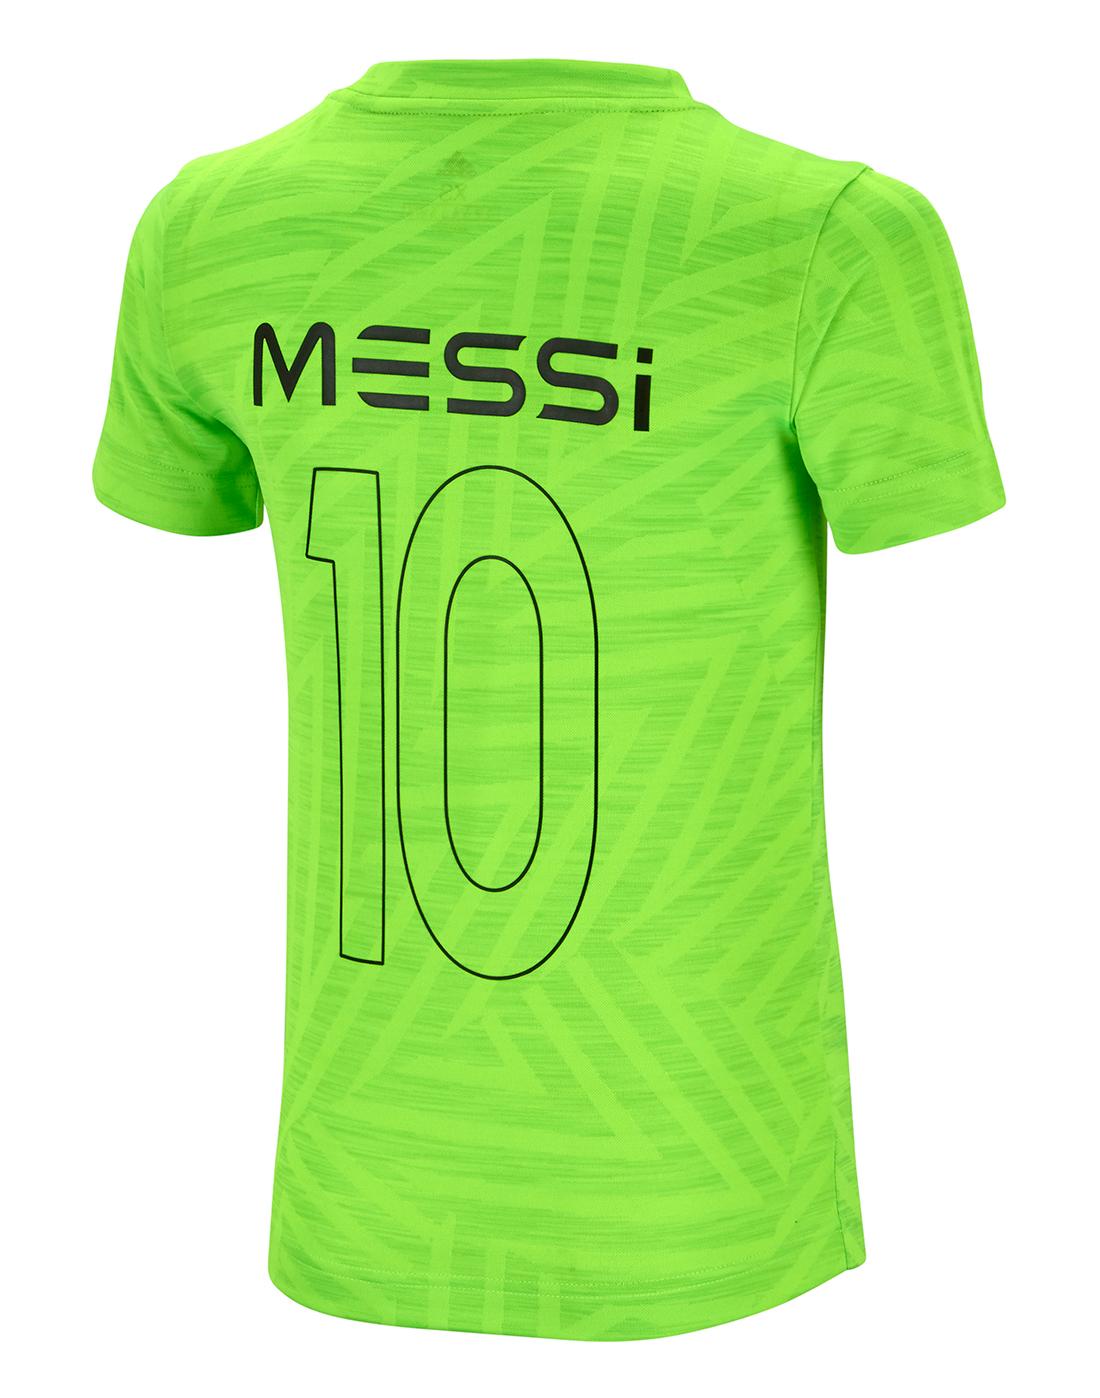 aaa8c9fb9c5 Boy s Green adidas Messi Icon T-Shirt